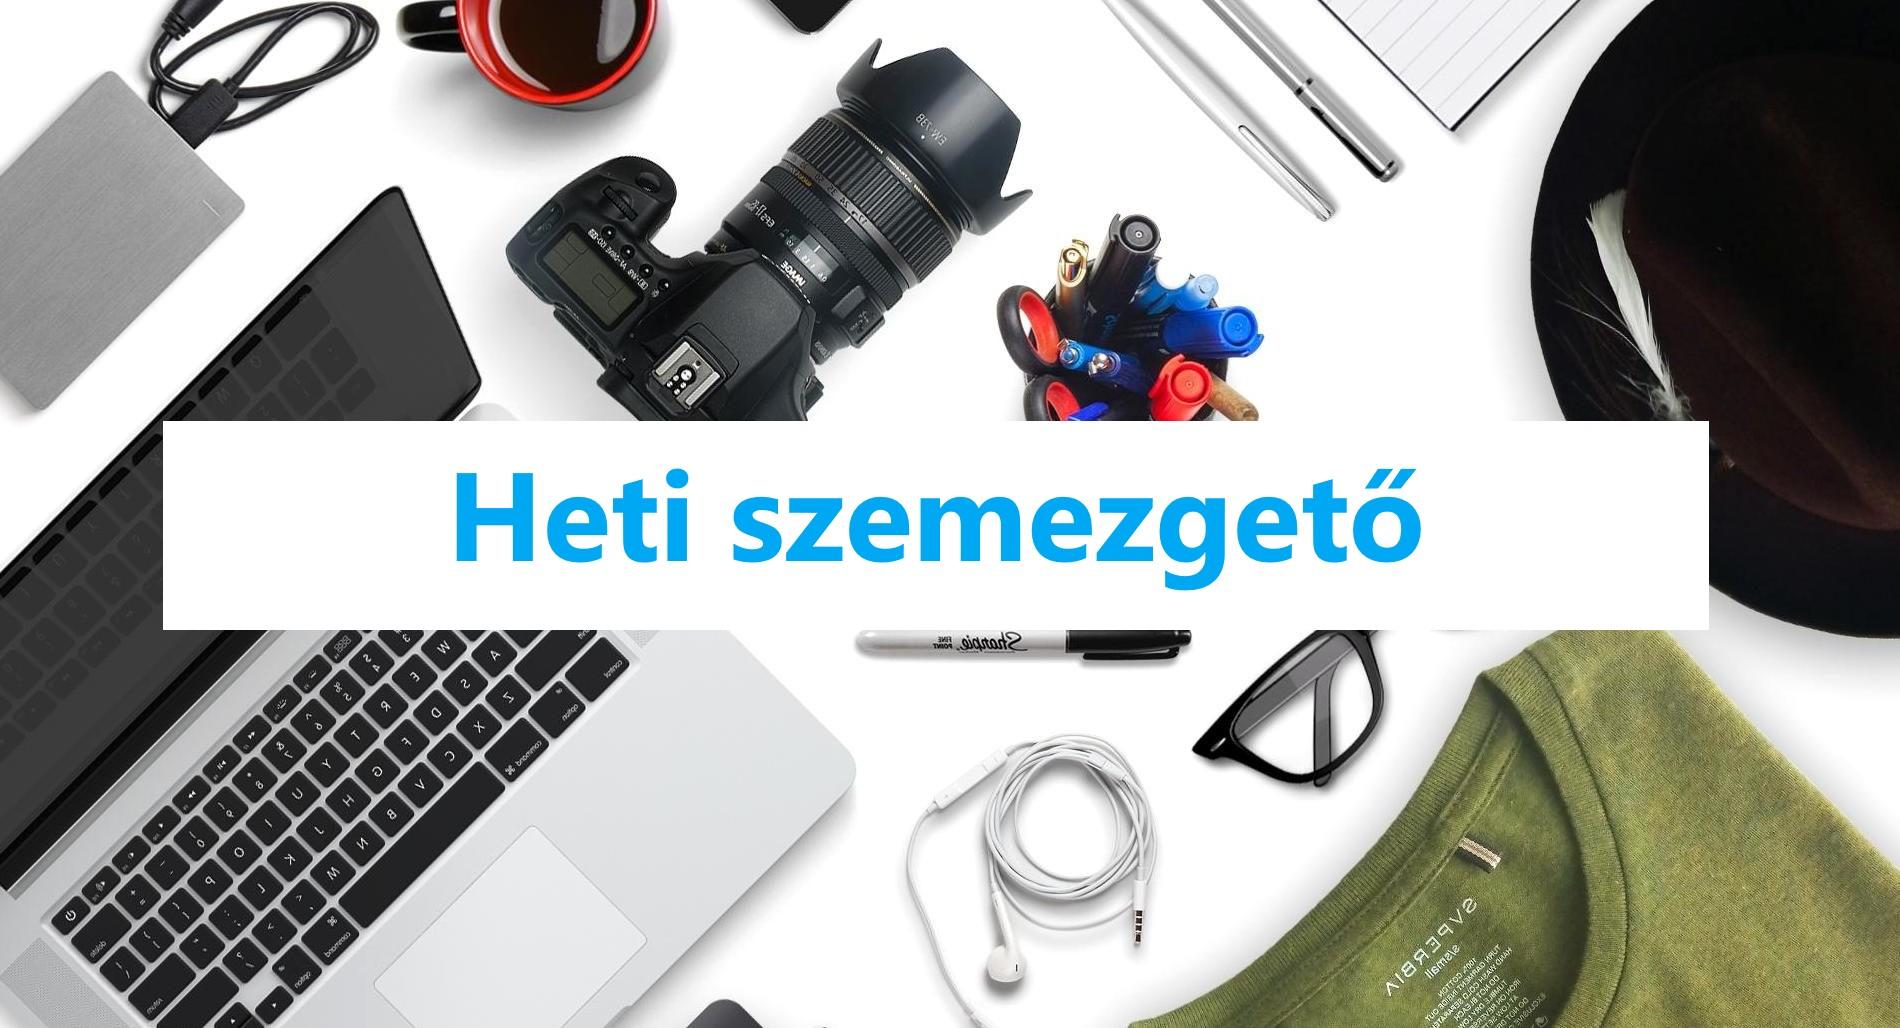 heti_szemezgeto_uj_11.jpg